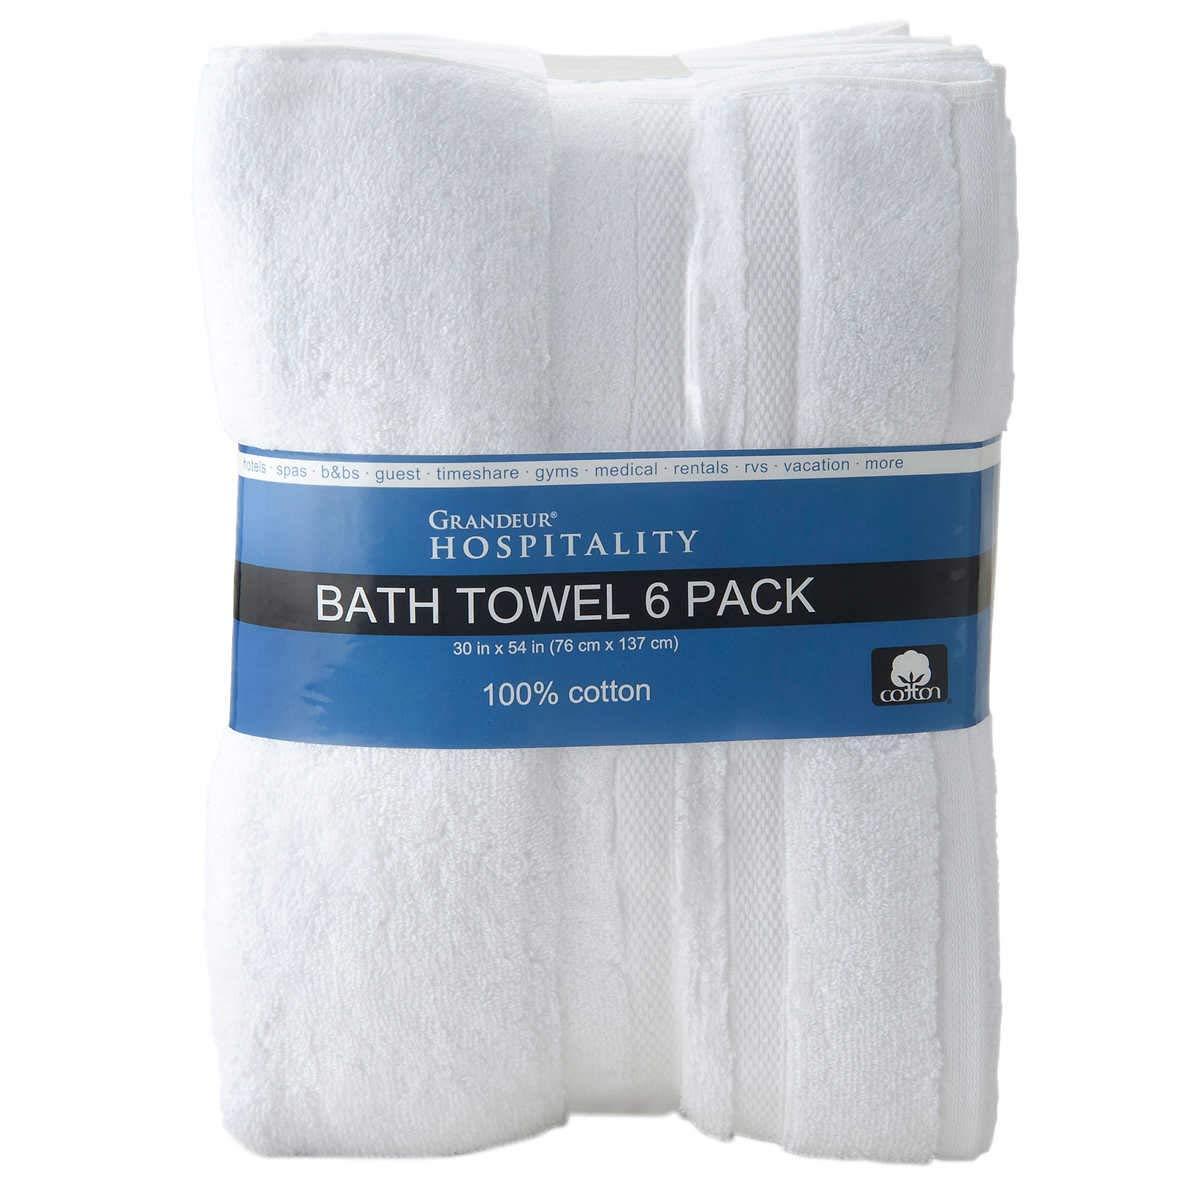 Omni Linens Grandeur Hospitality Bath Towel 6 Pack 34'' x 54'' 100% Cotton 6 Pack